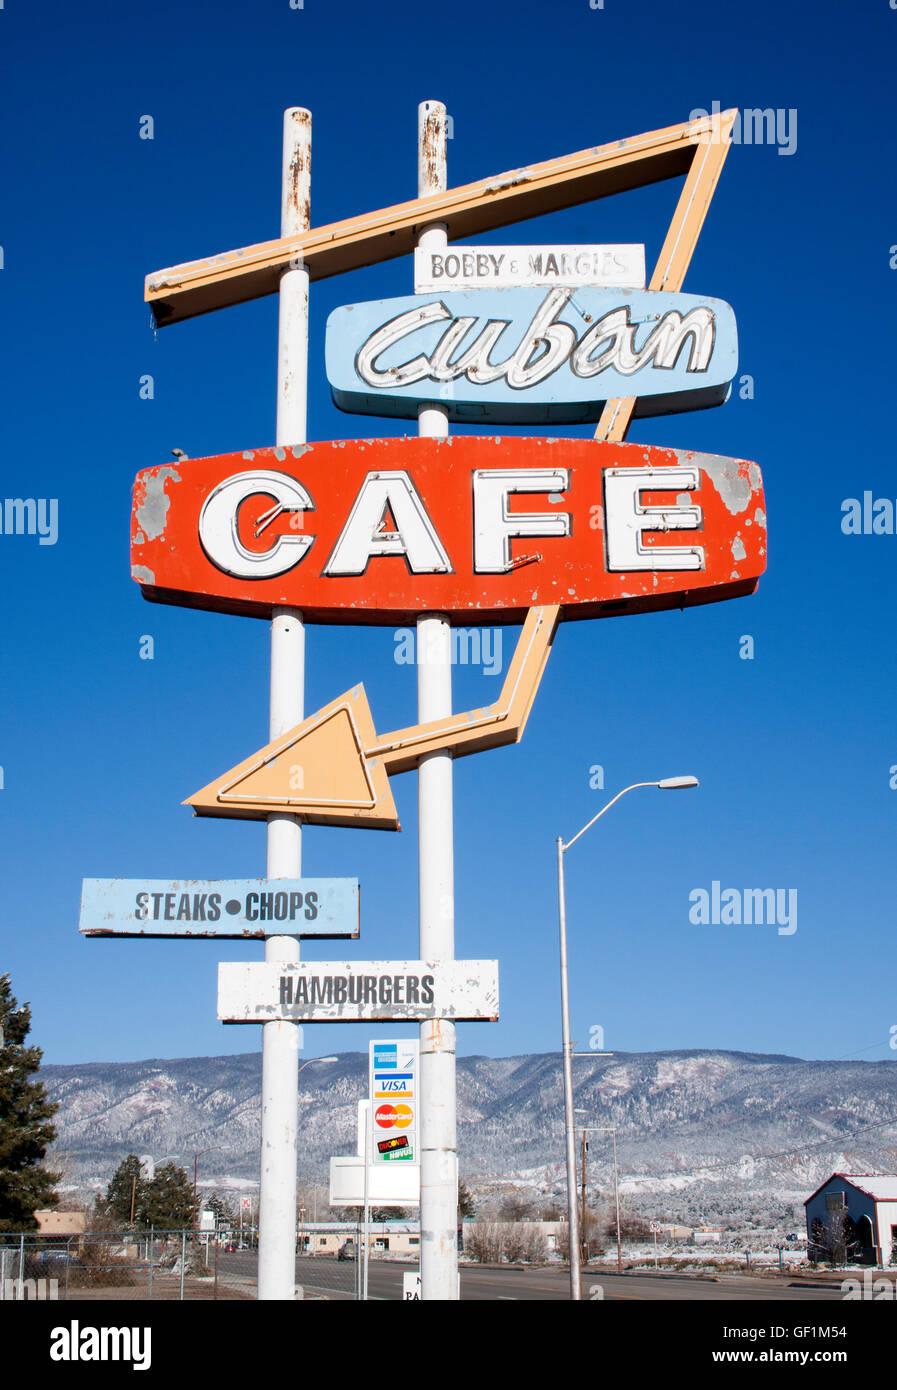 Kubanischen Cafe Zeichen in Kuba New Mexico Stockbild